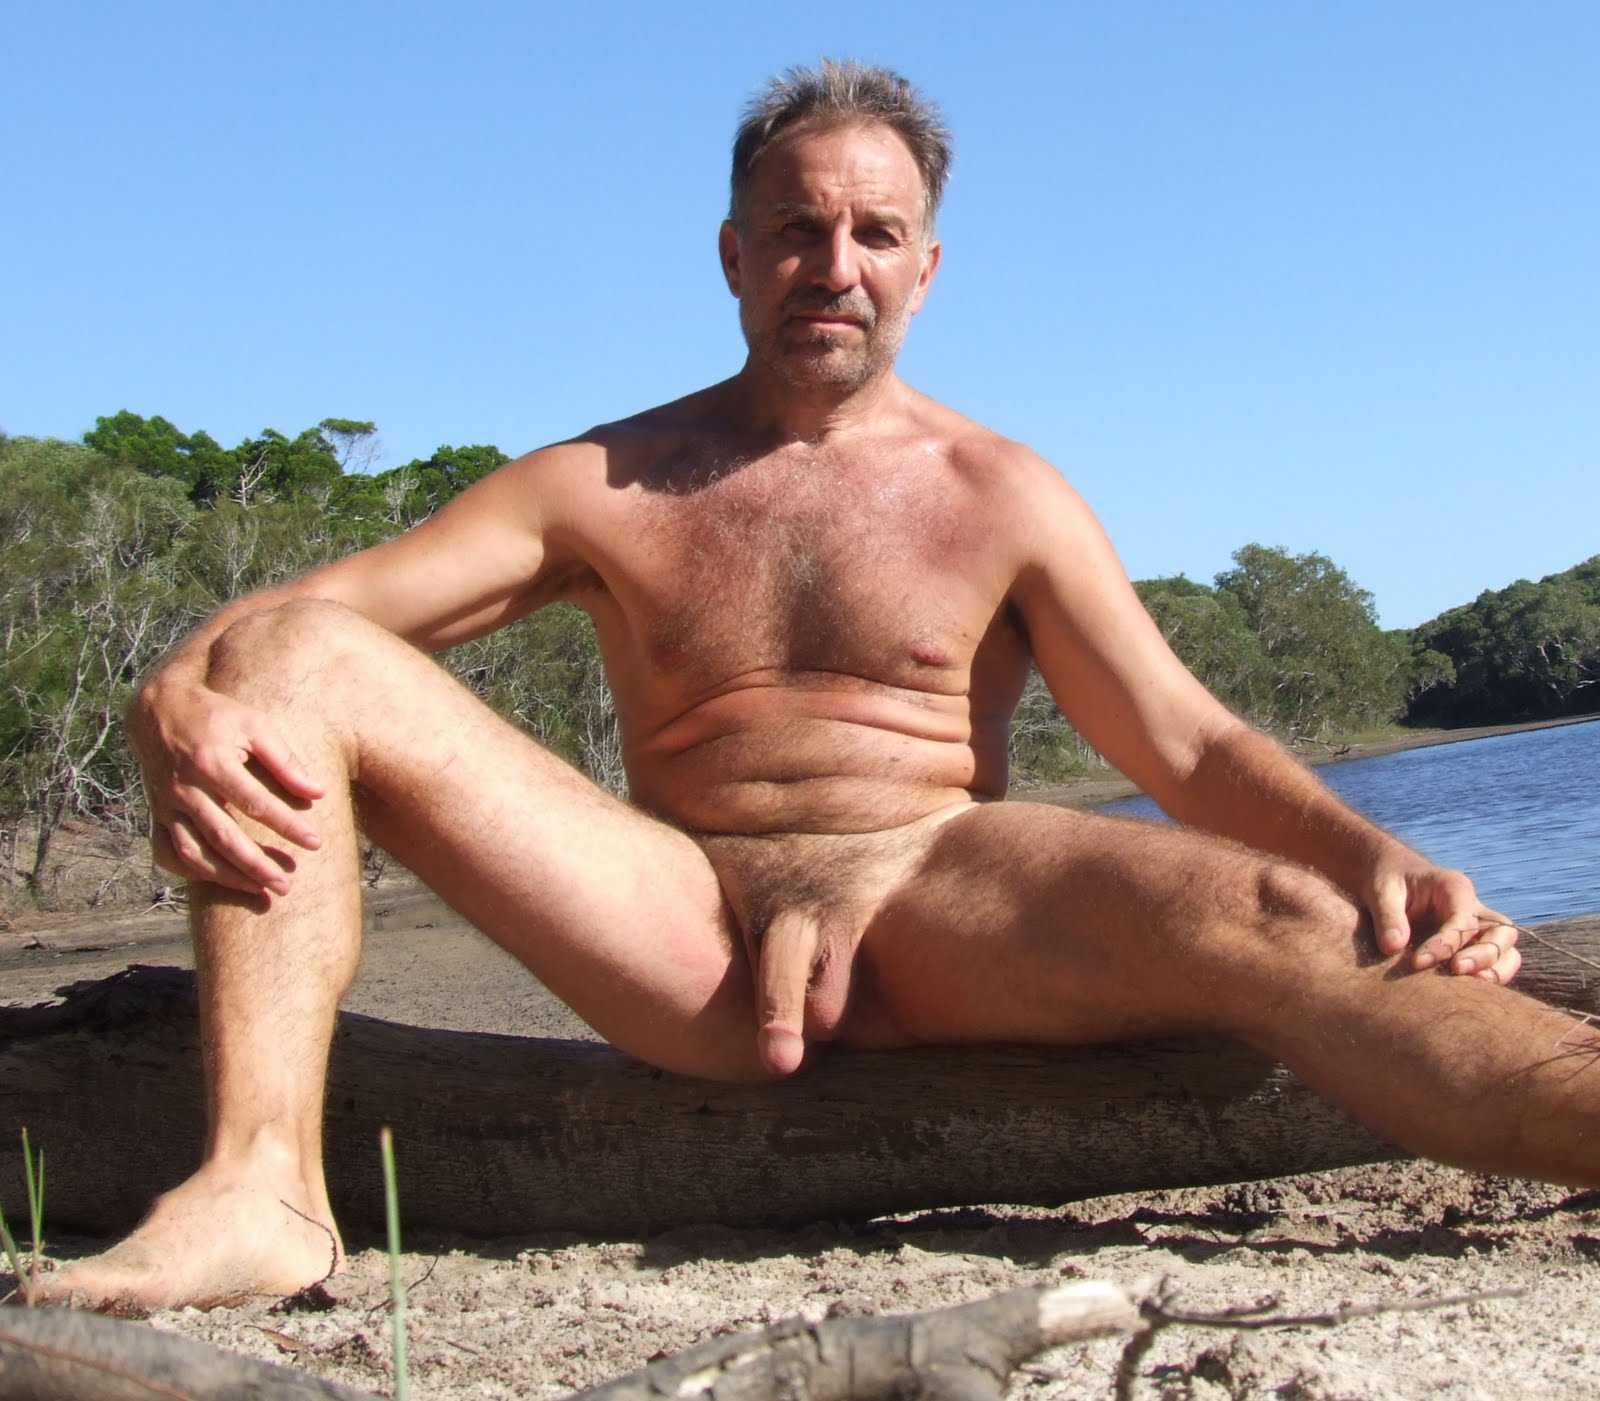 http://2.bp.blogspot.com/-t88Bls6kibw/TZzkVmf9_KI/AAAAAAAAY9Y/8Y5Q4RartCw/s1600/JR3.jpg